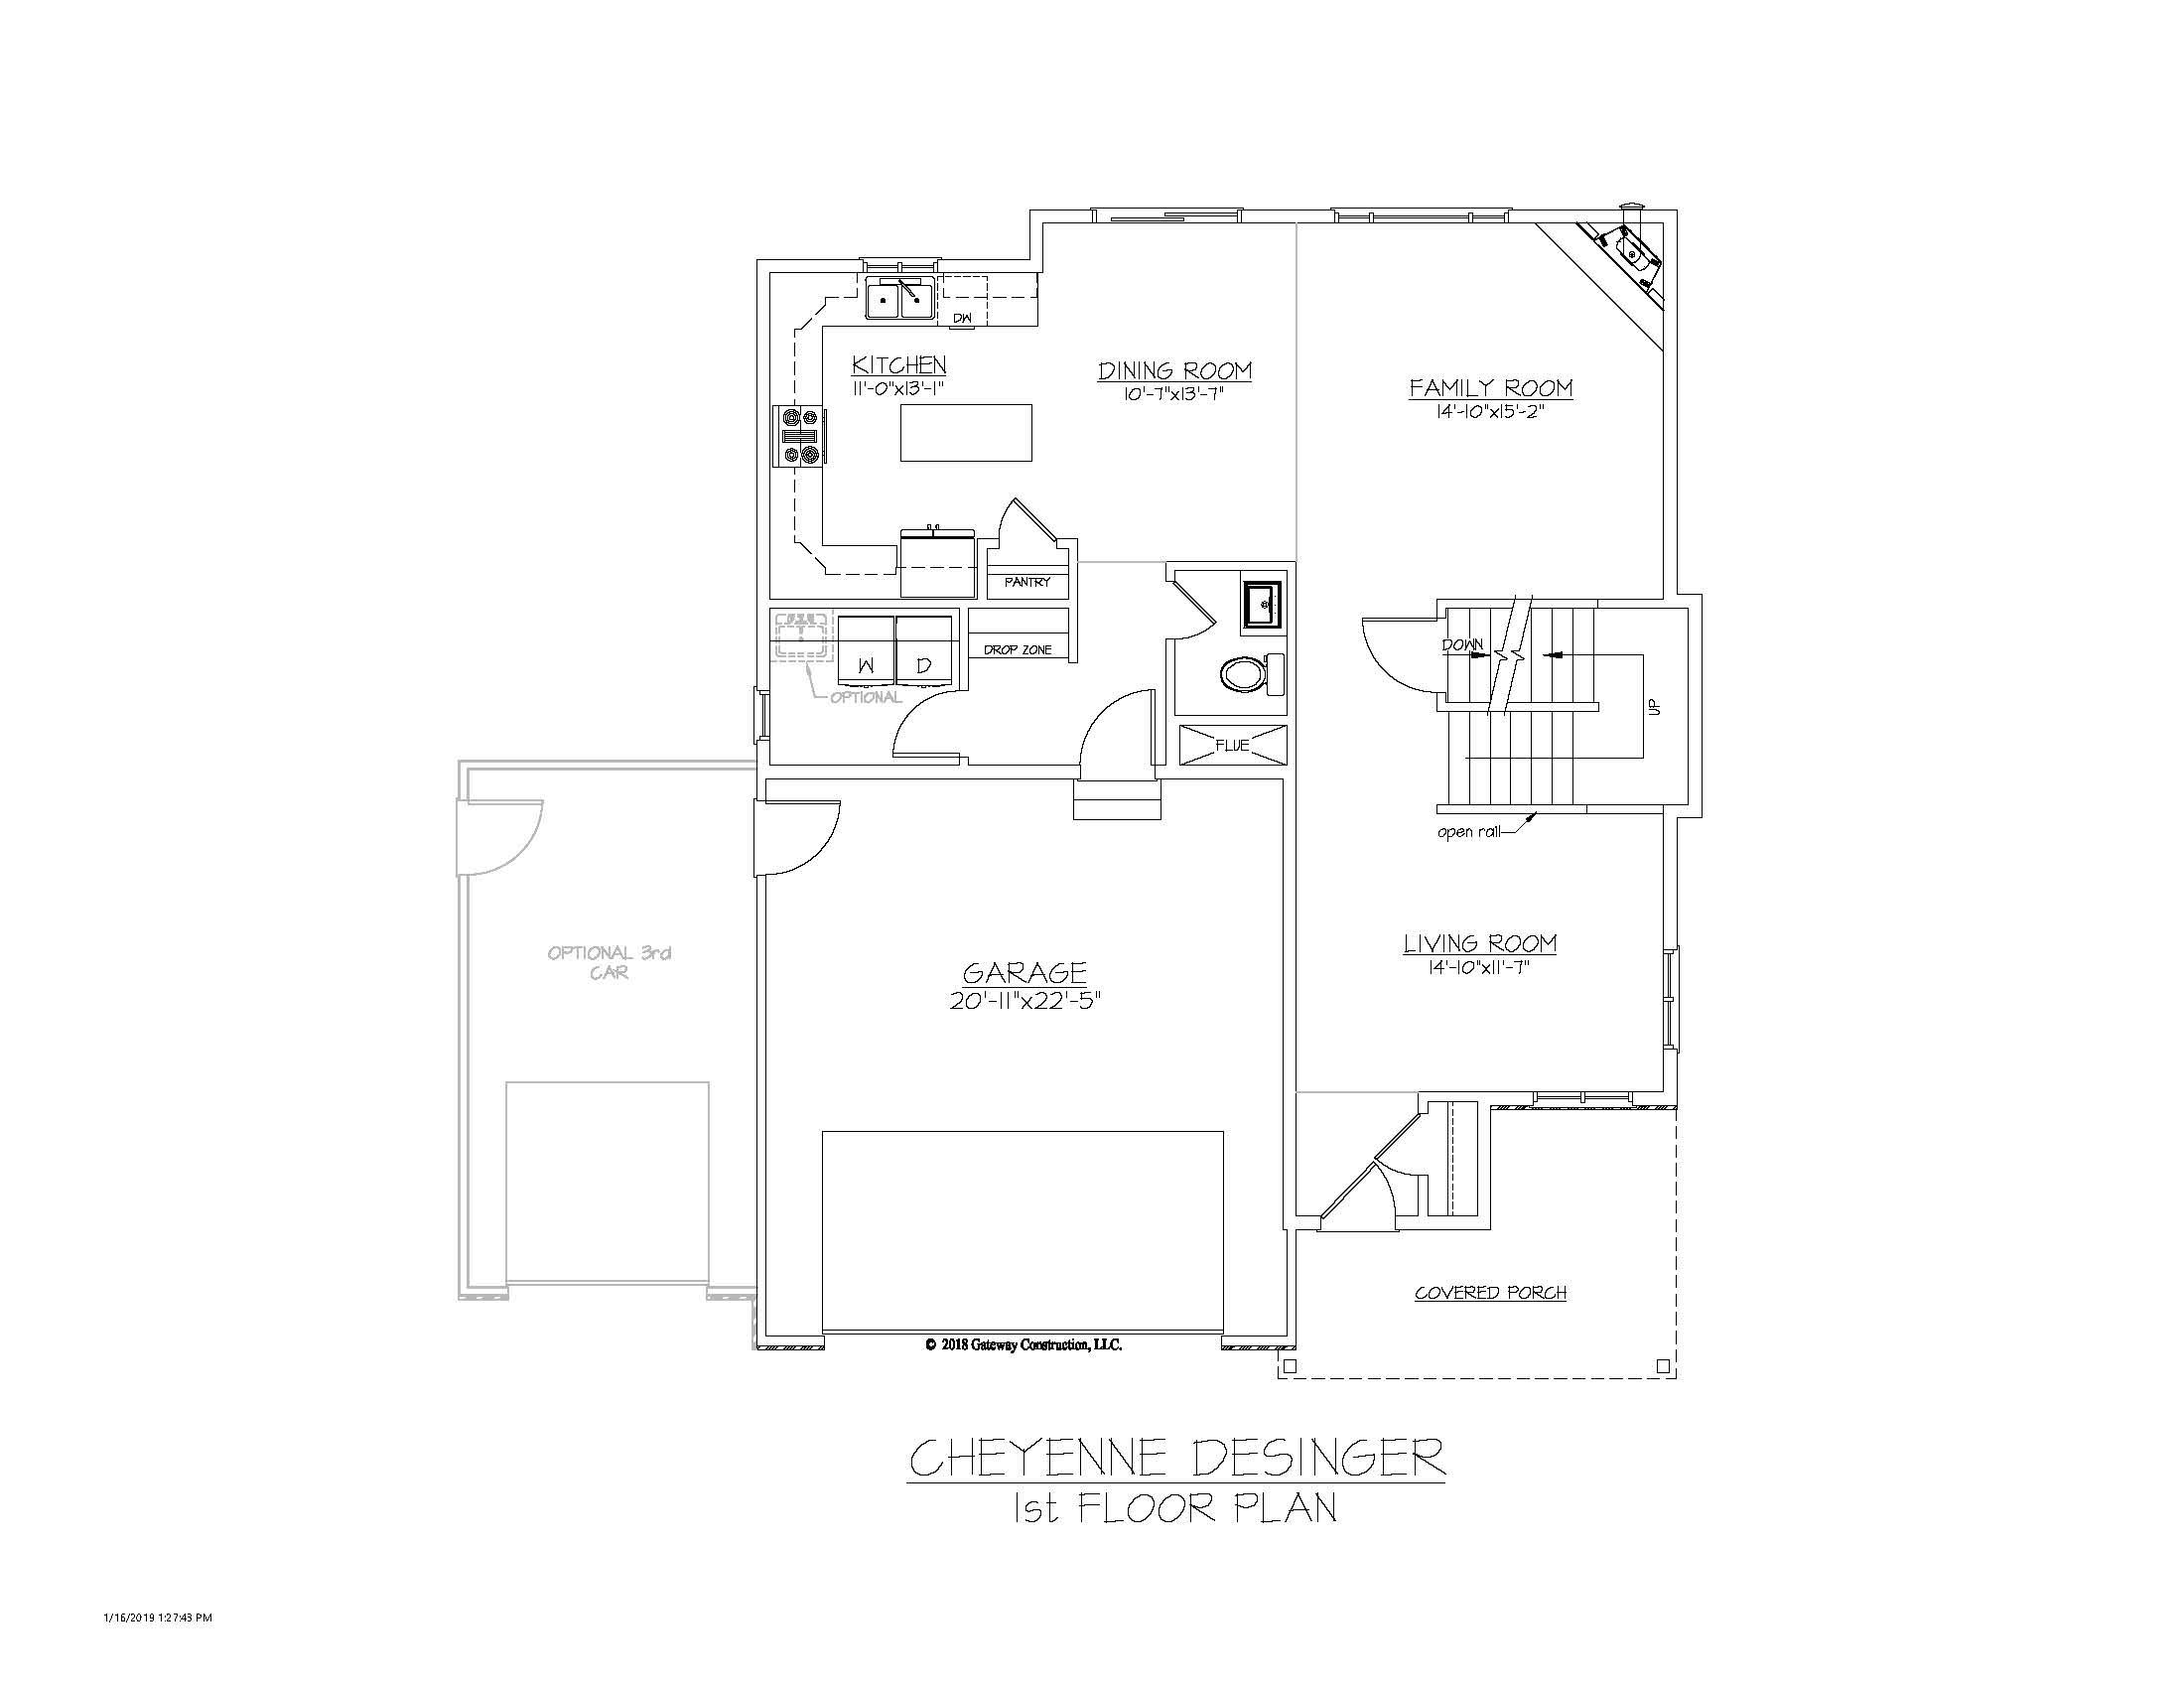 Cheyenne GL 1st Floor Plan - D